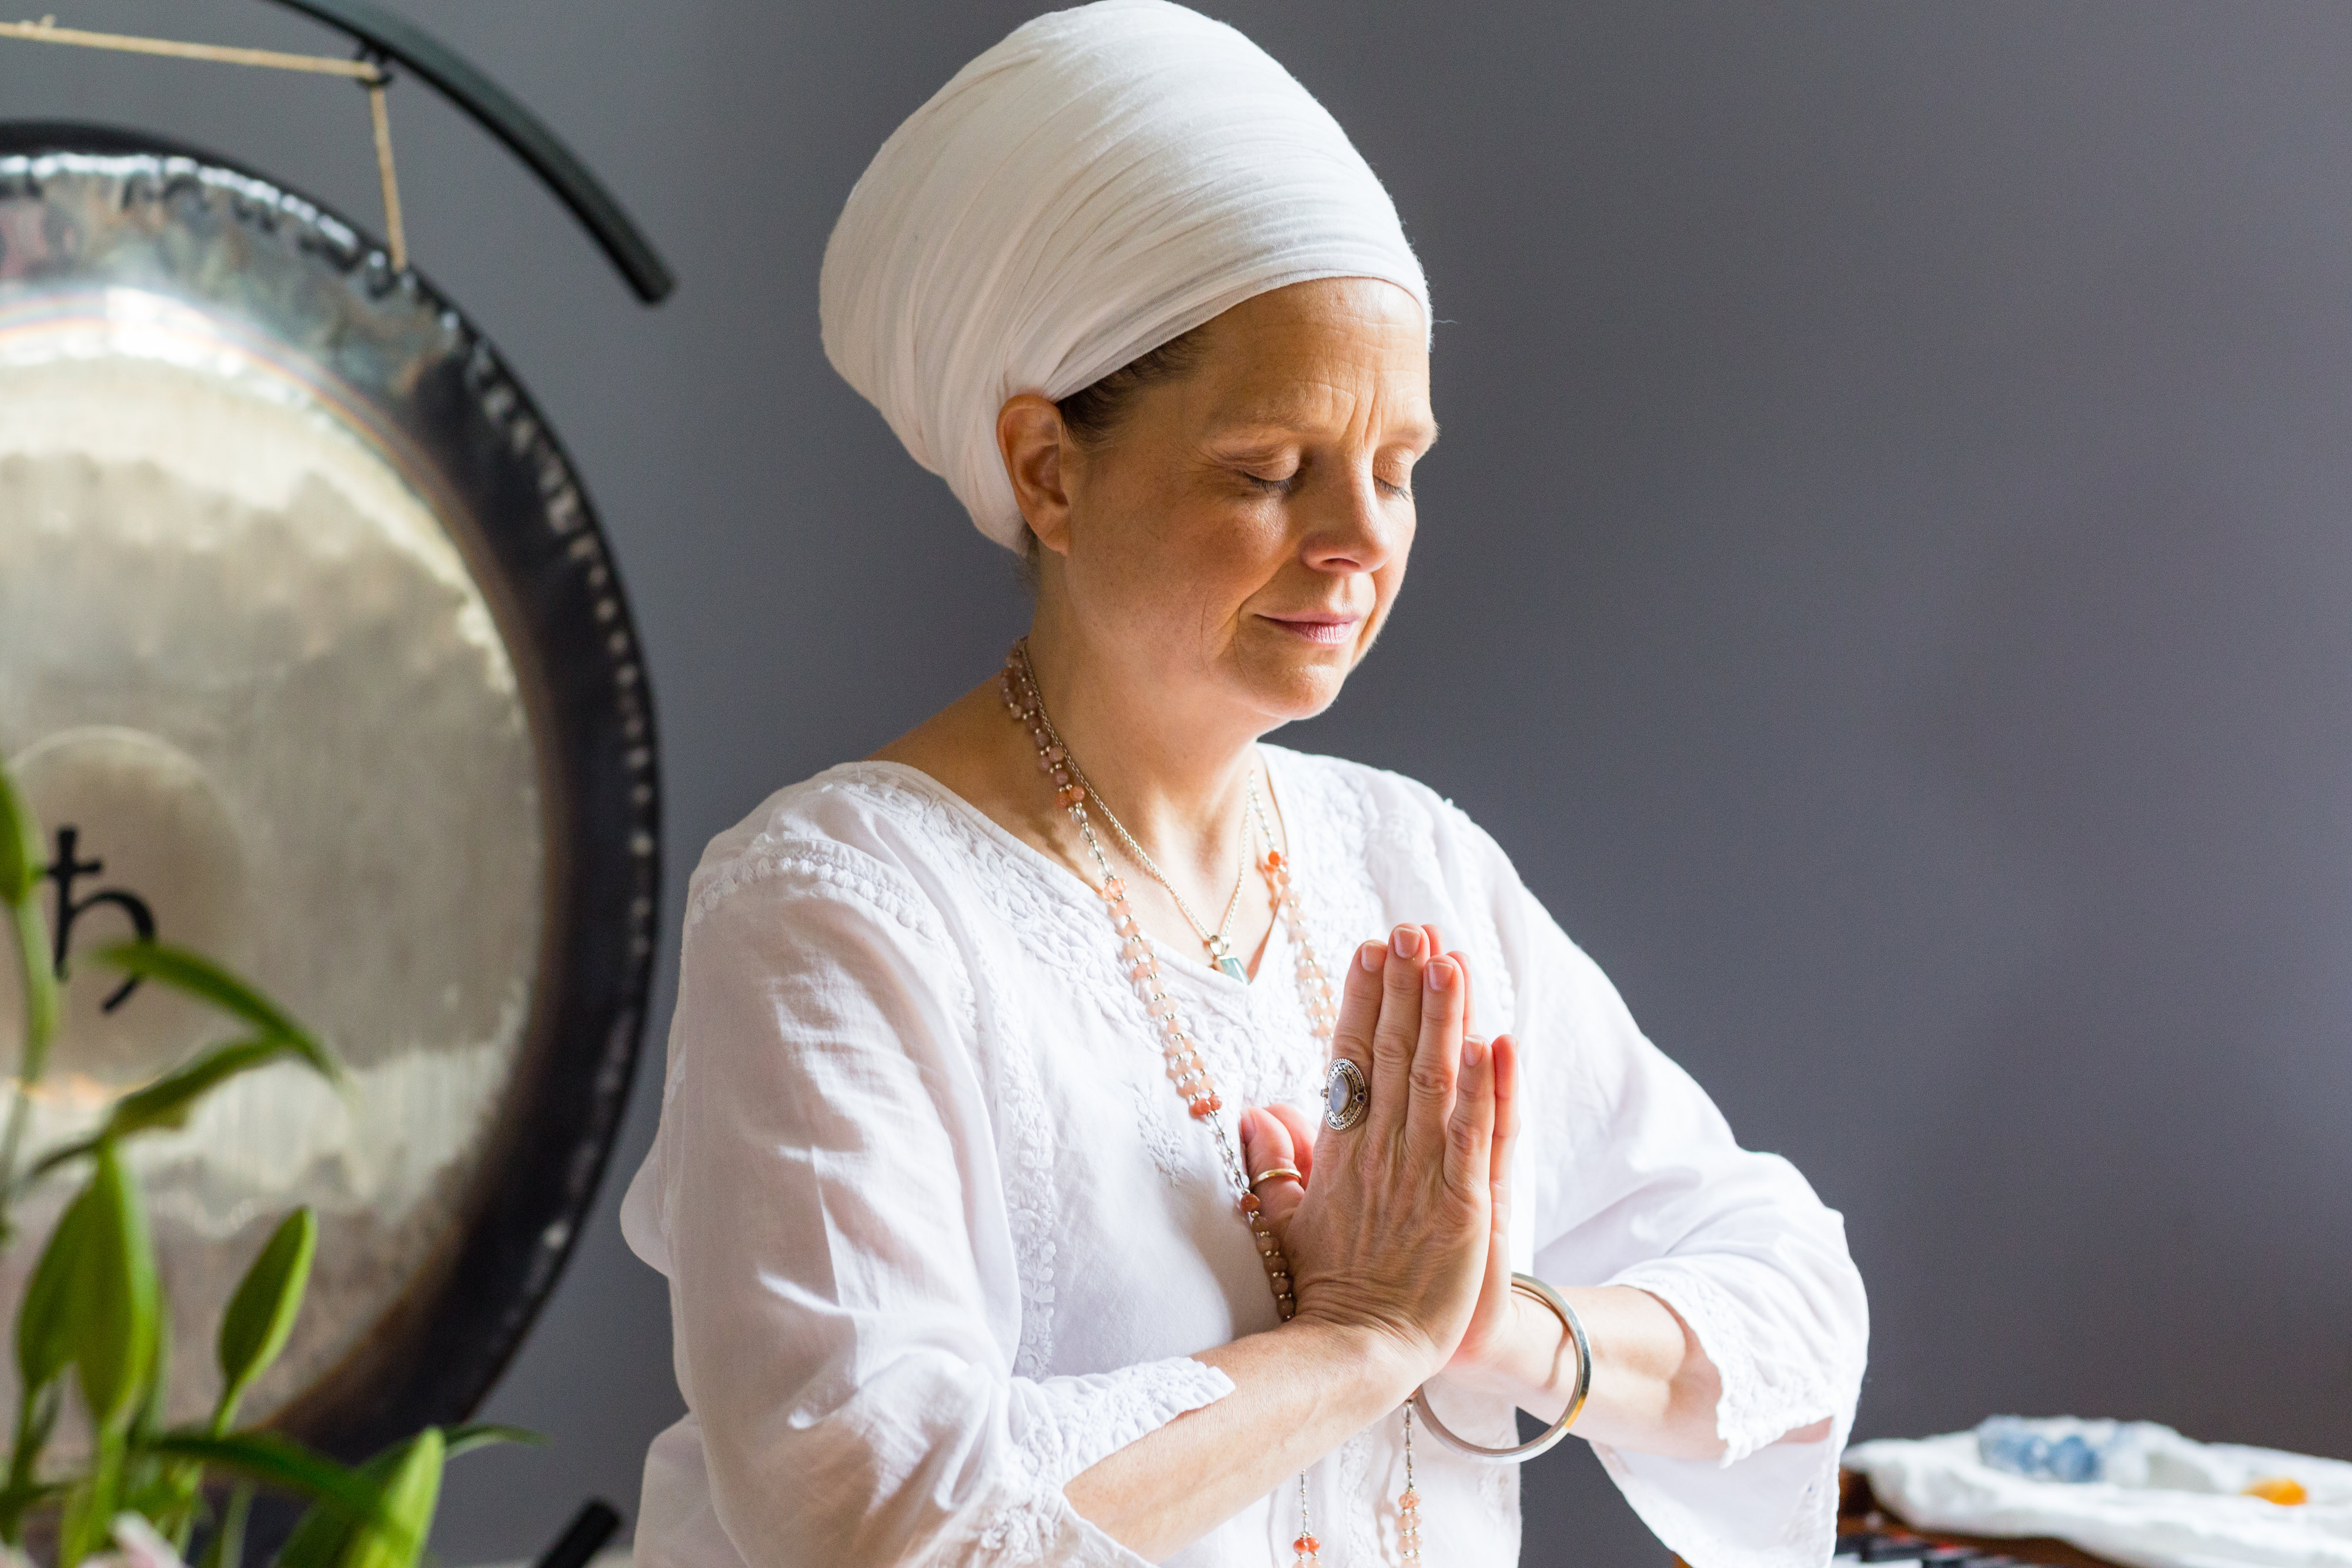 Kundalini-Yoga-Was-ist-genau-Aquarian-Sadhana-